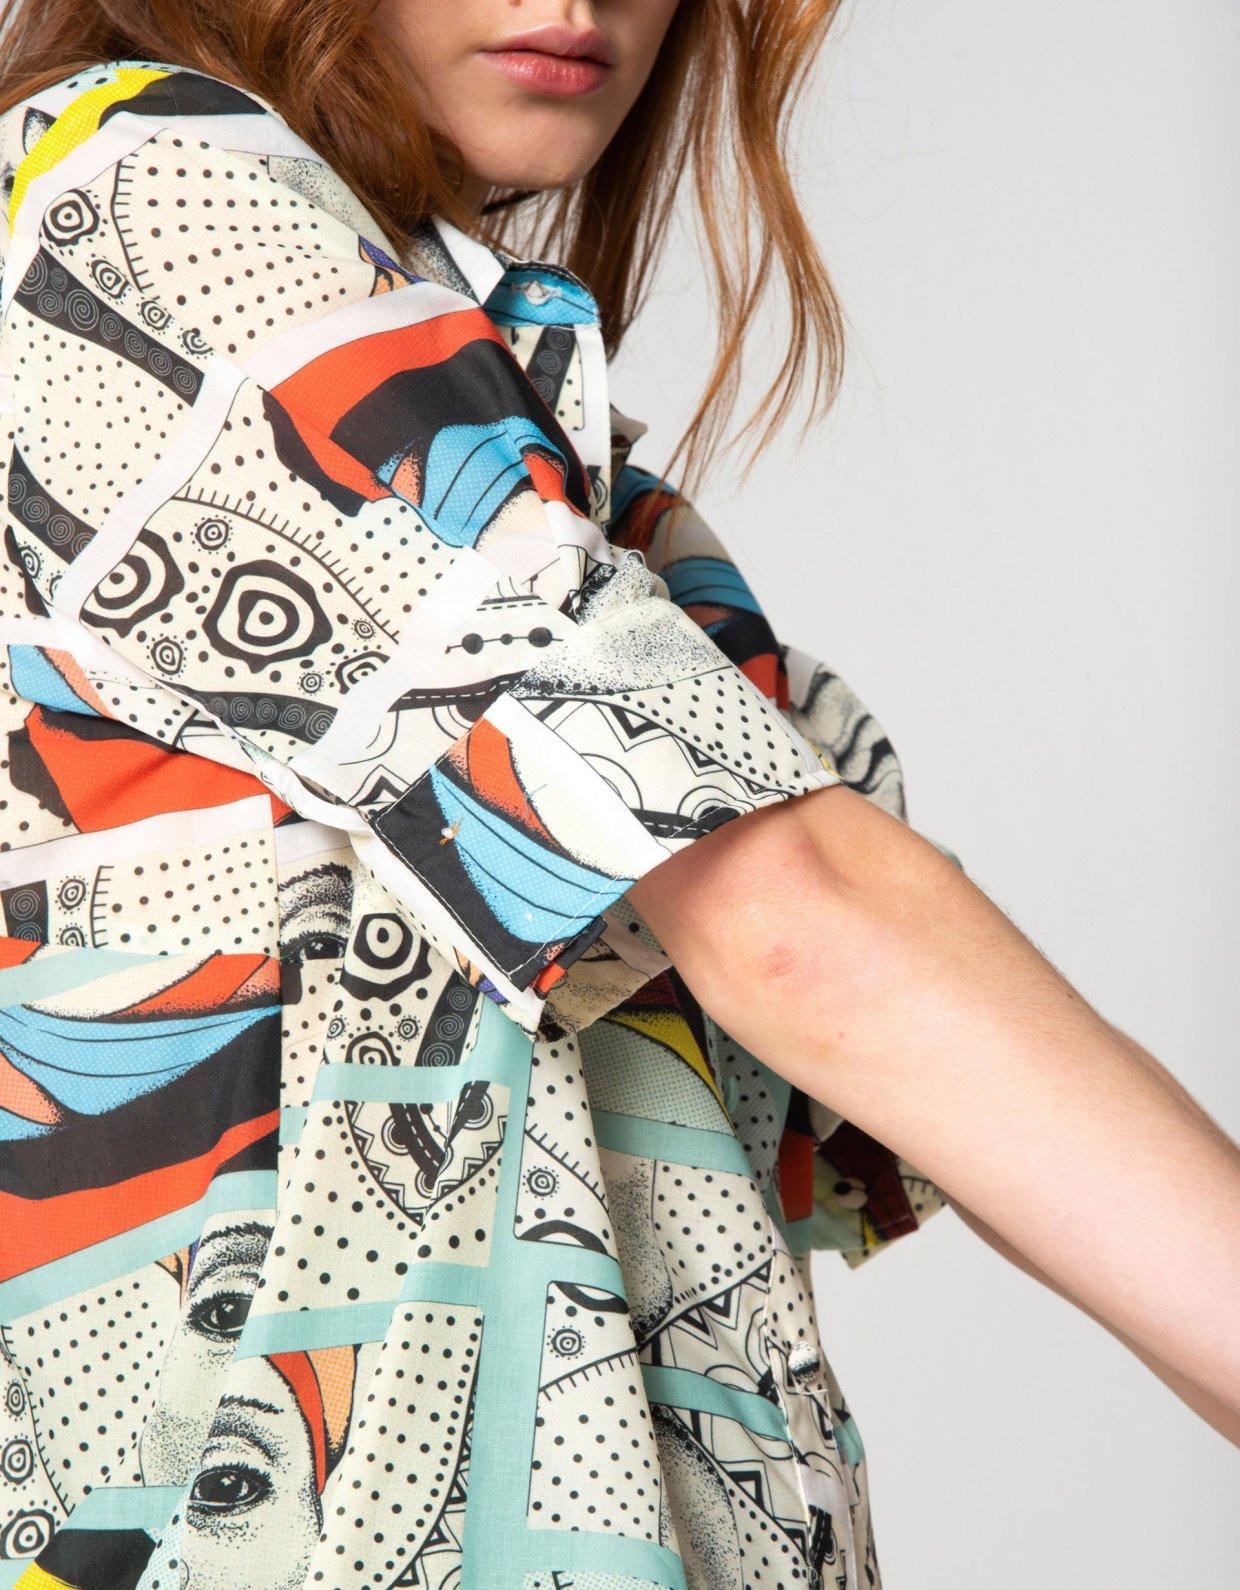 Nadia Rapti Andy short shirt/dress